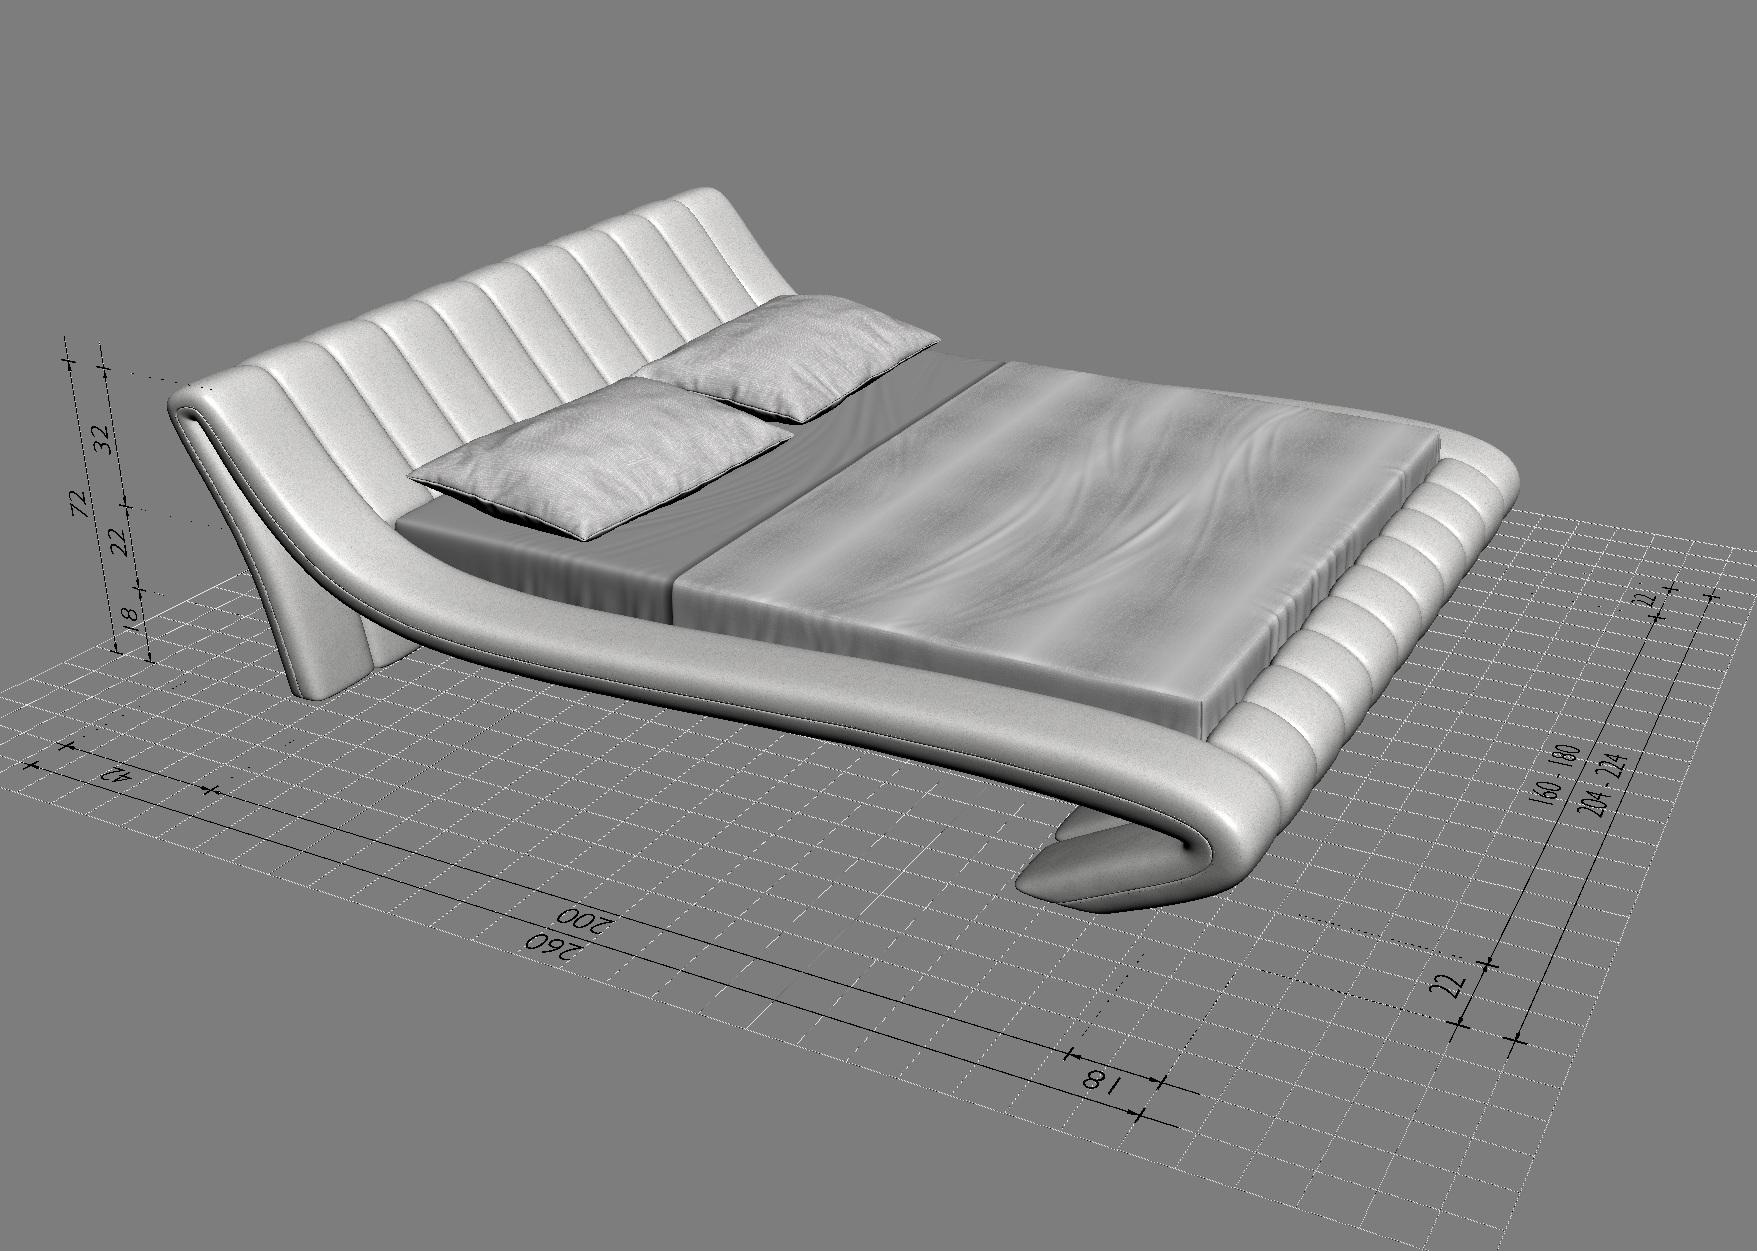 wasserbett ferrara led komplett set mit led kaufen bei pmr handelsgesellschaft mbh. Black Bedroom Furniture Sets. Home Design Ideas